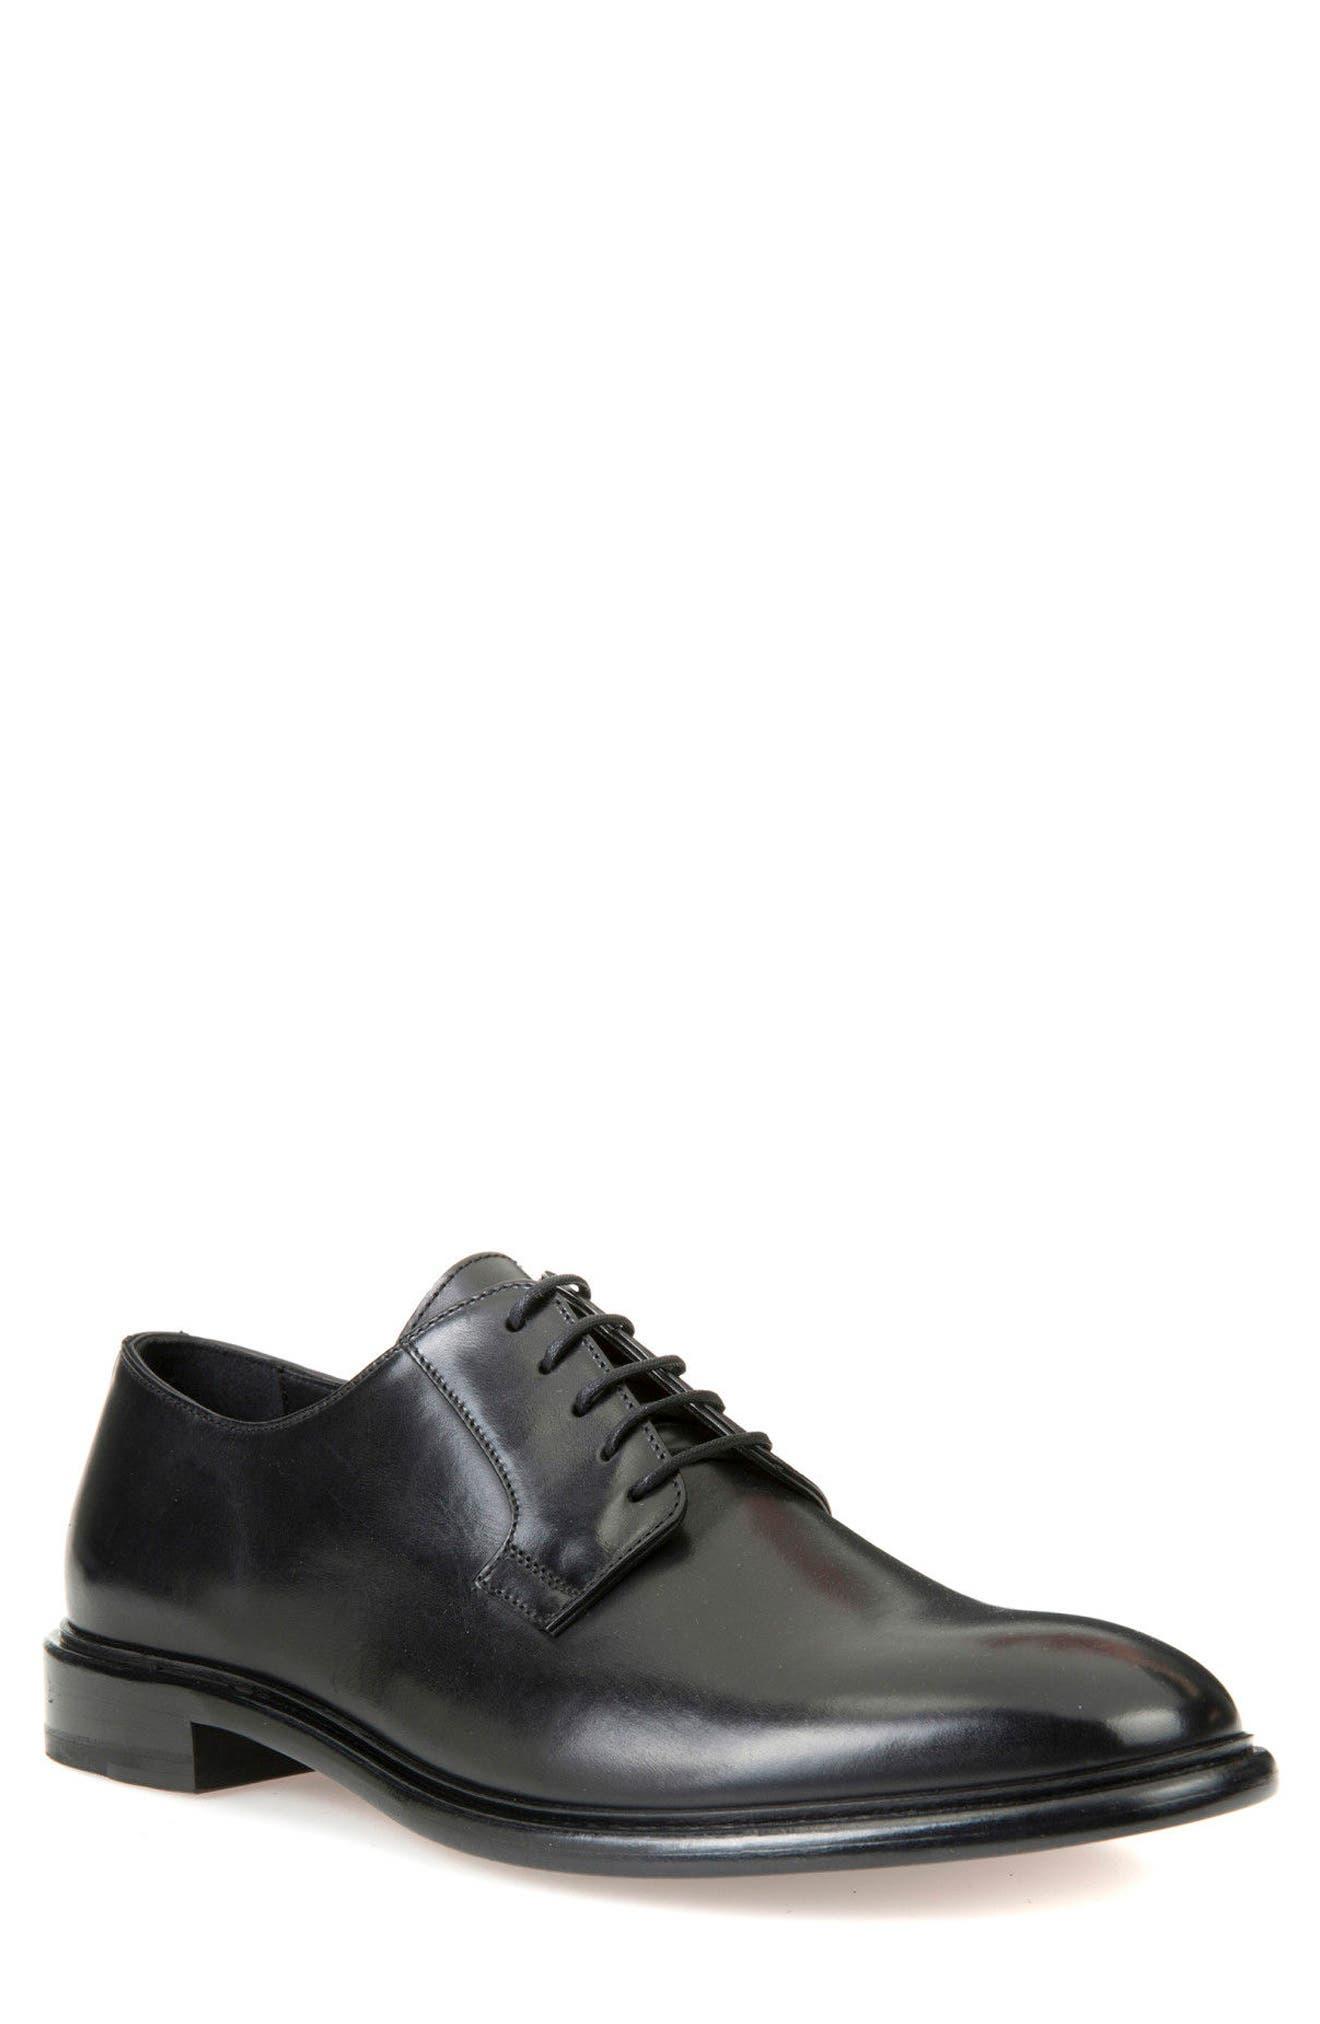 Geox Guildford 7 Plain Toe Derby (Men)